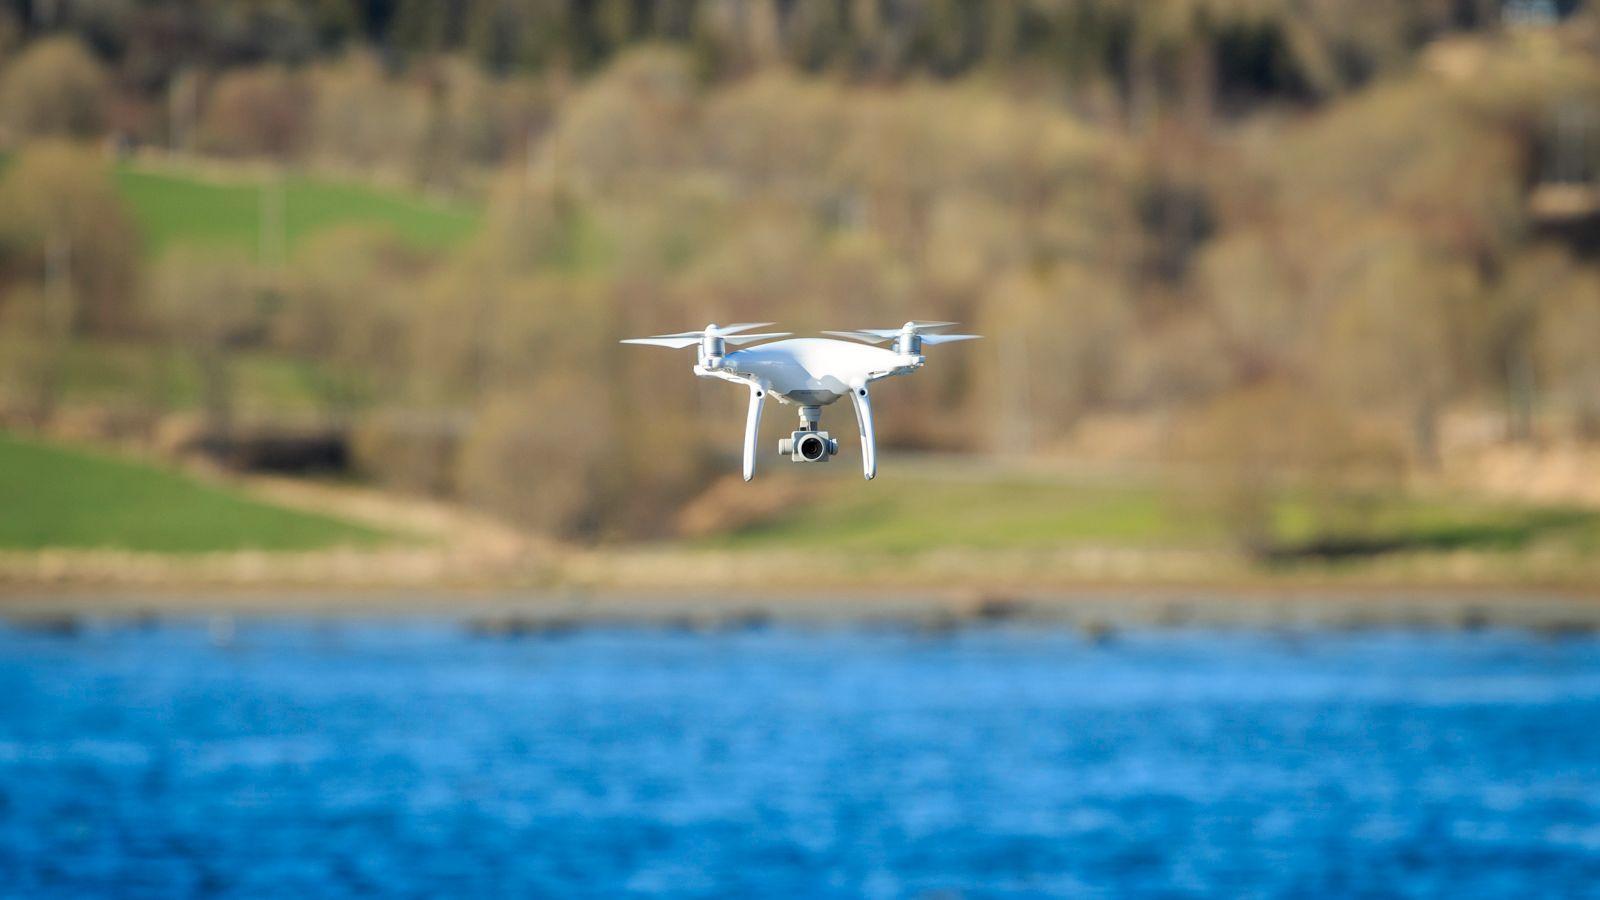 Skal gjøre droner lydløse